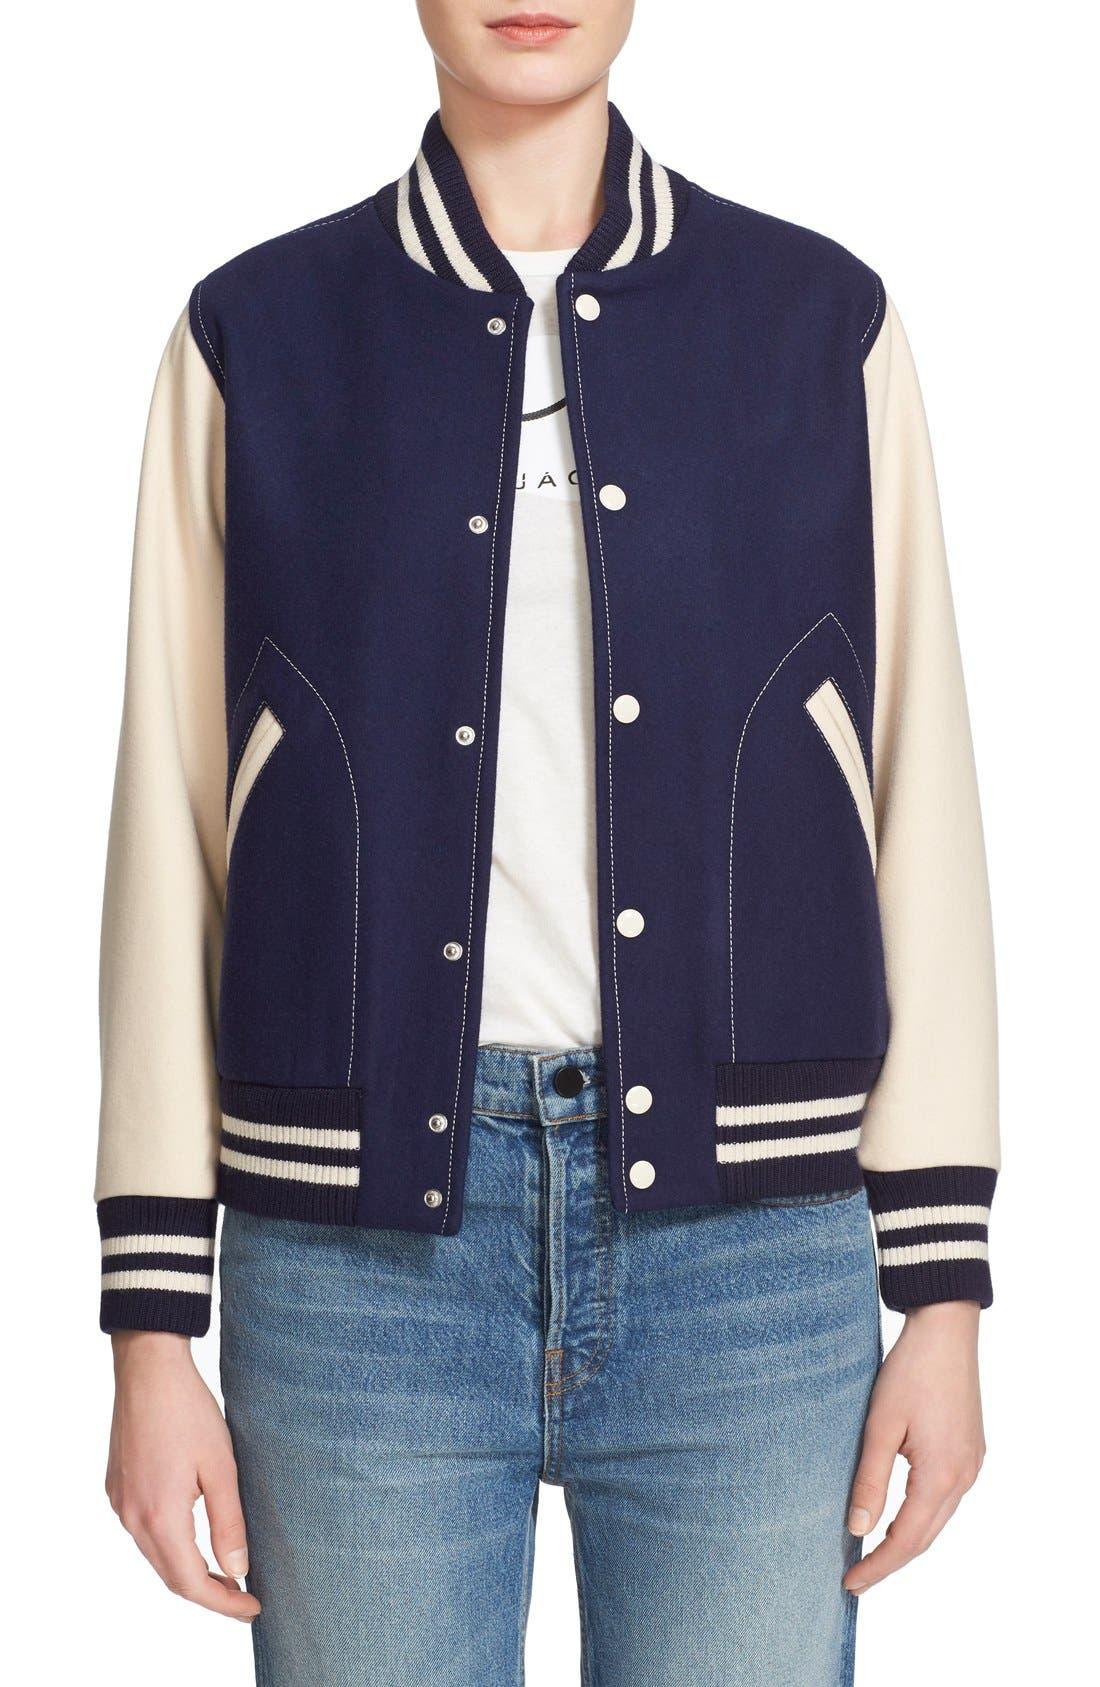 Main Image - MARC JACOBS Shrunken Varsity Jacket